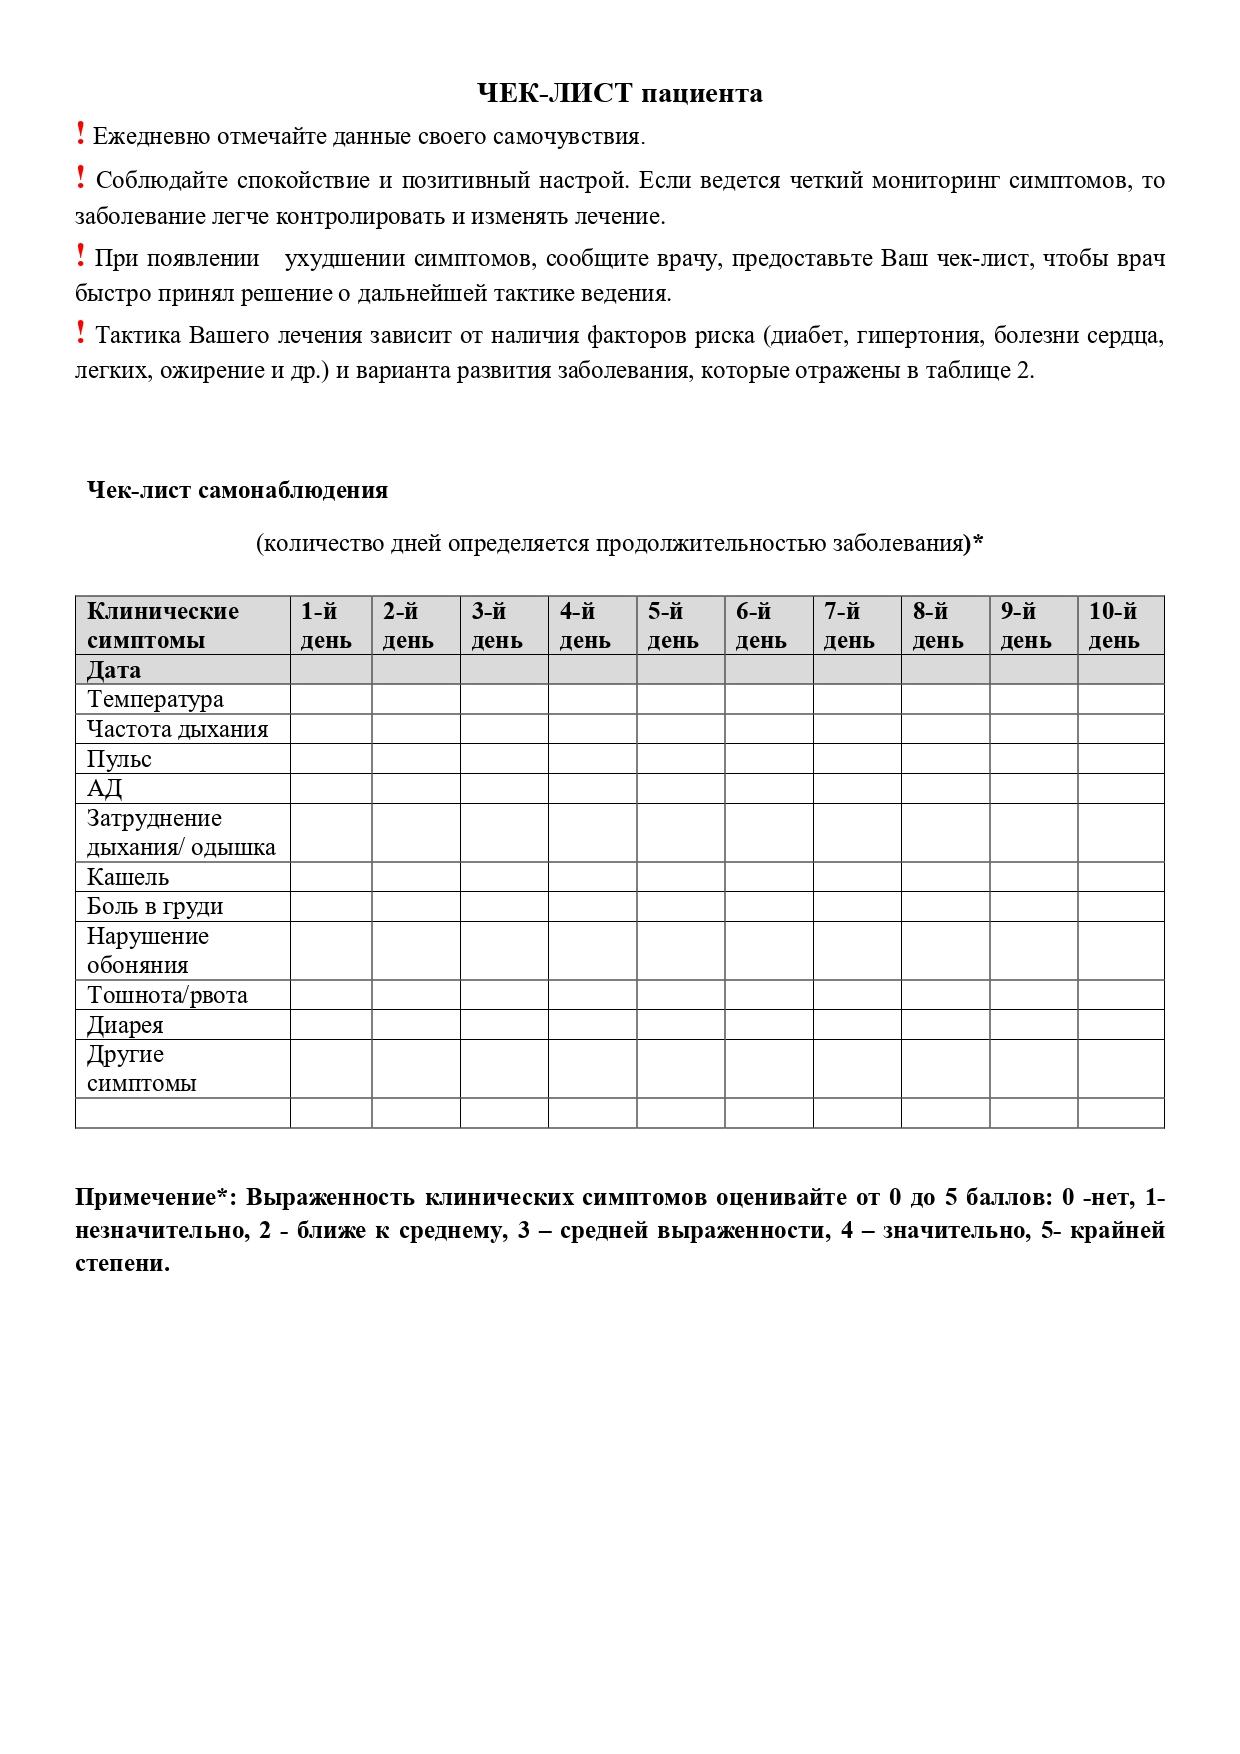 https://inbusiness.kz/ru/images/original/31/images/kMHBpUT4.jpg